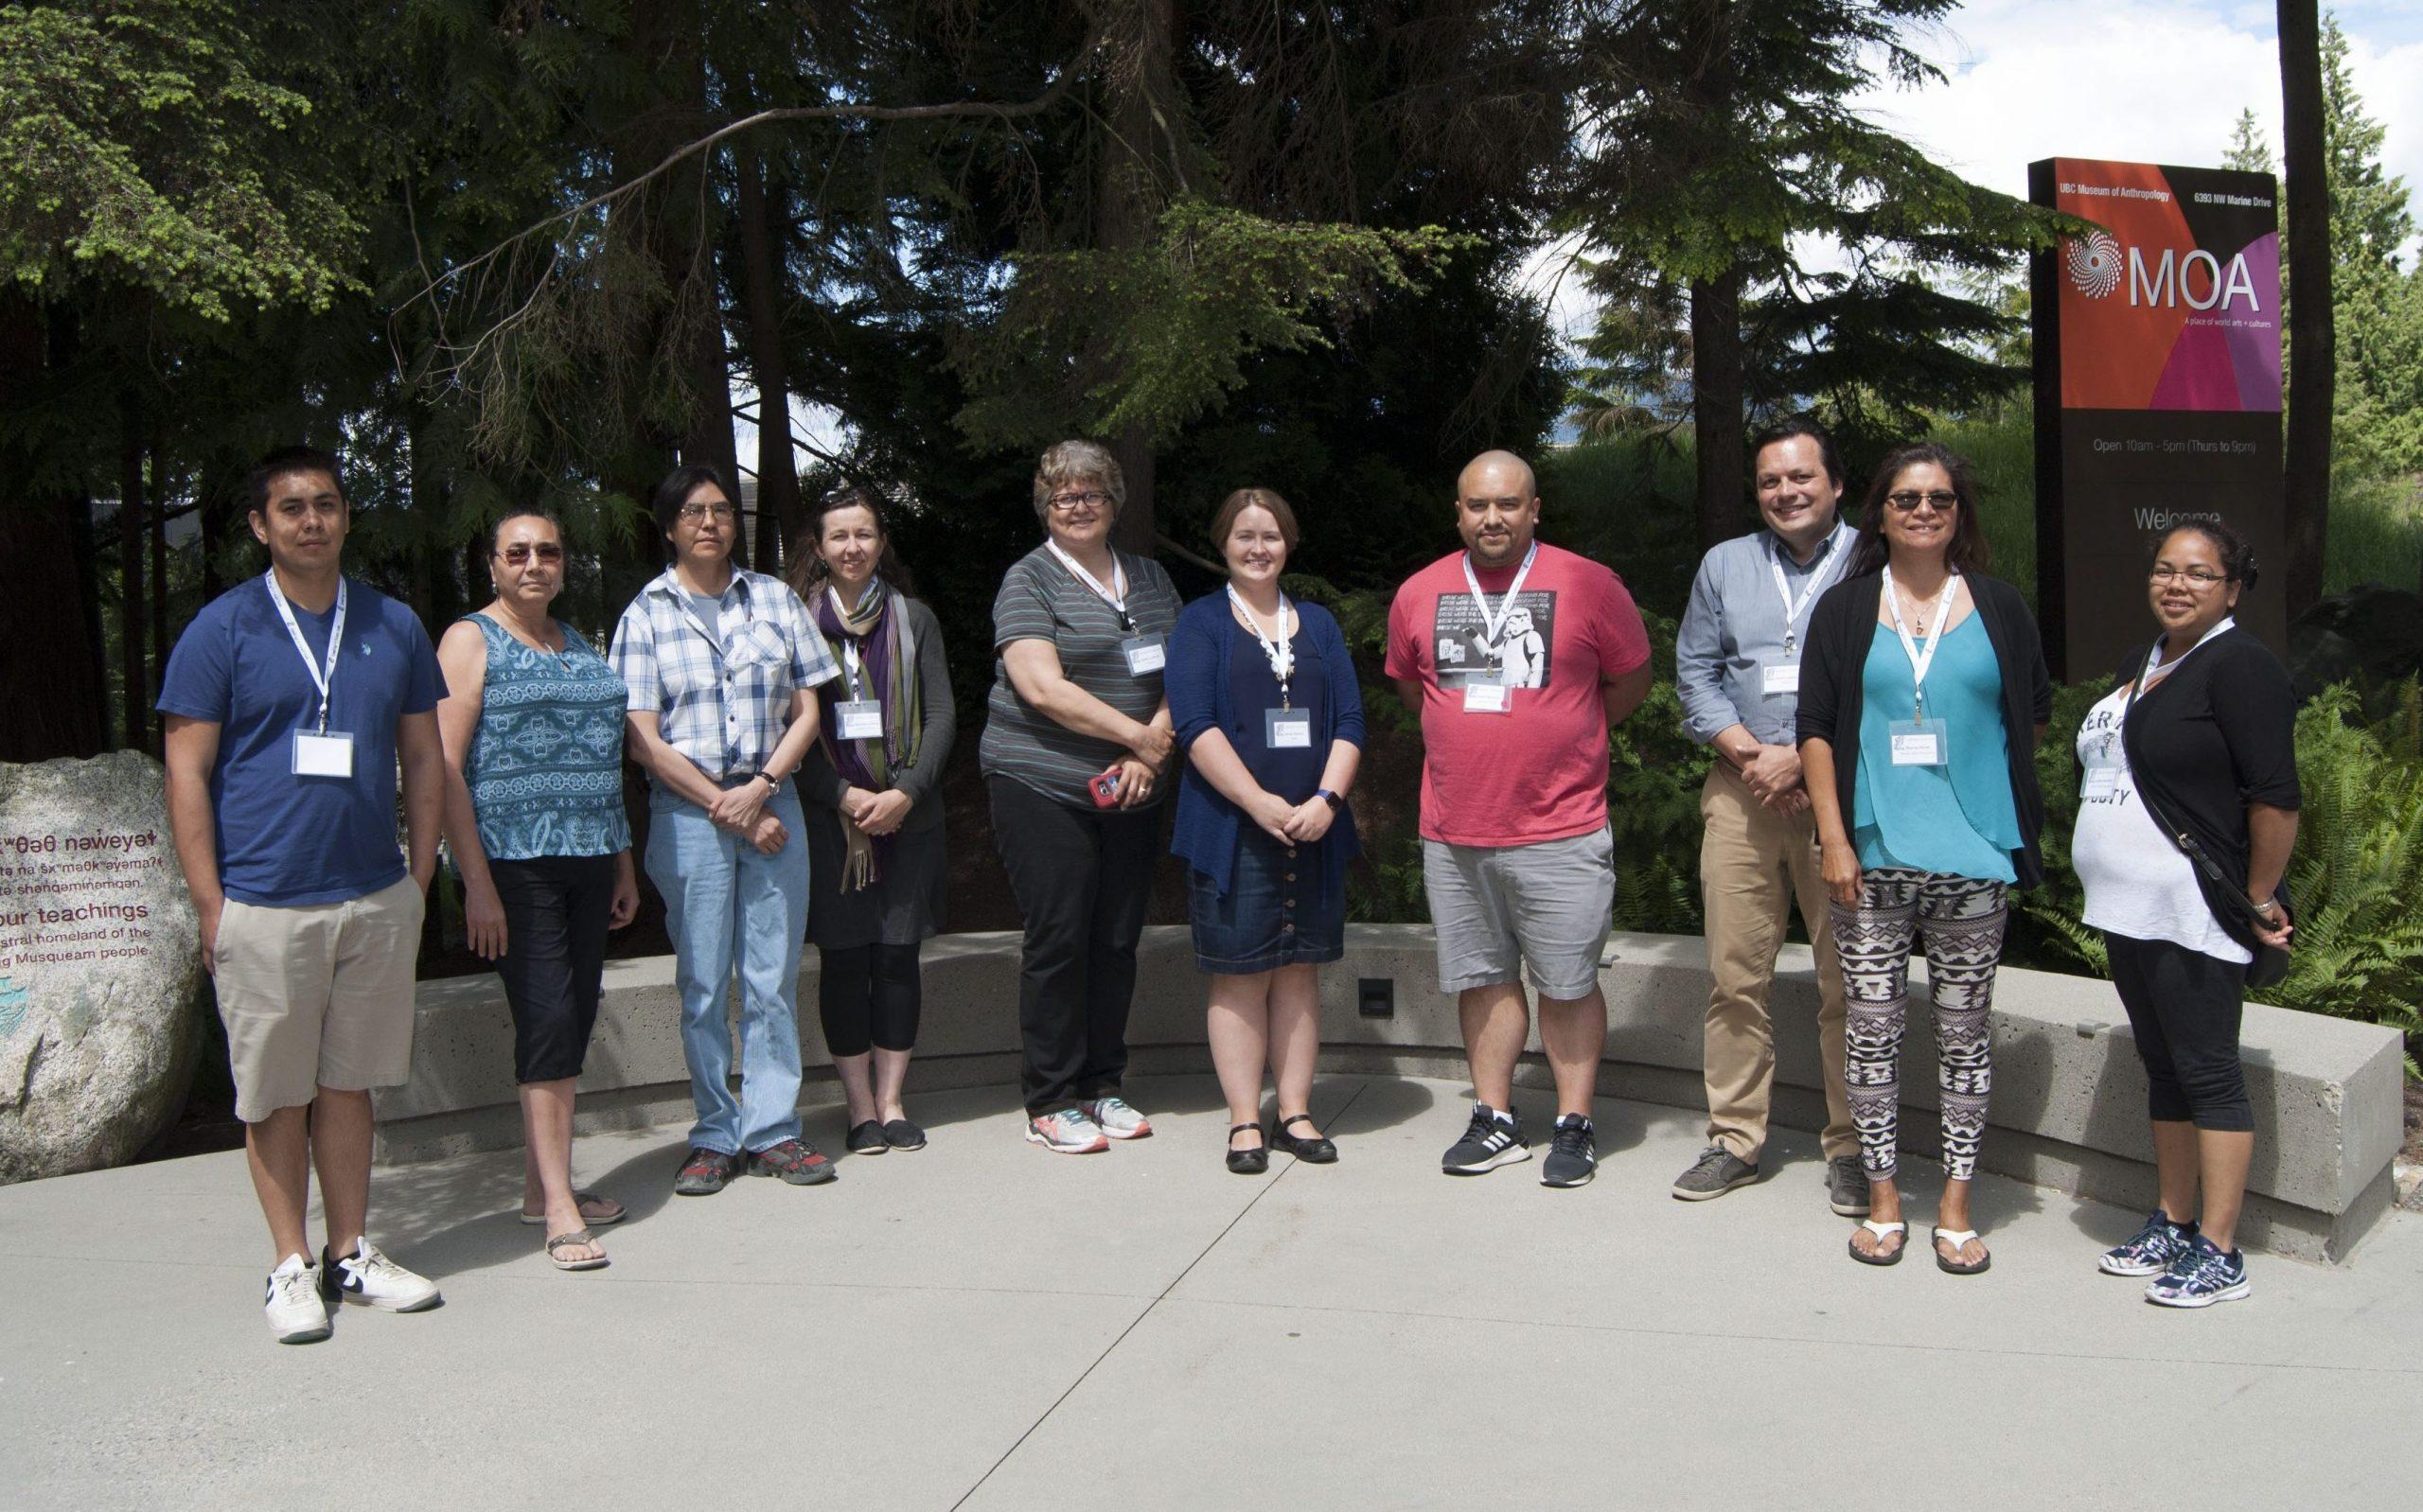 2018 ubc group photo